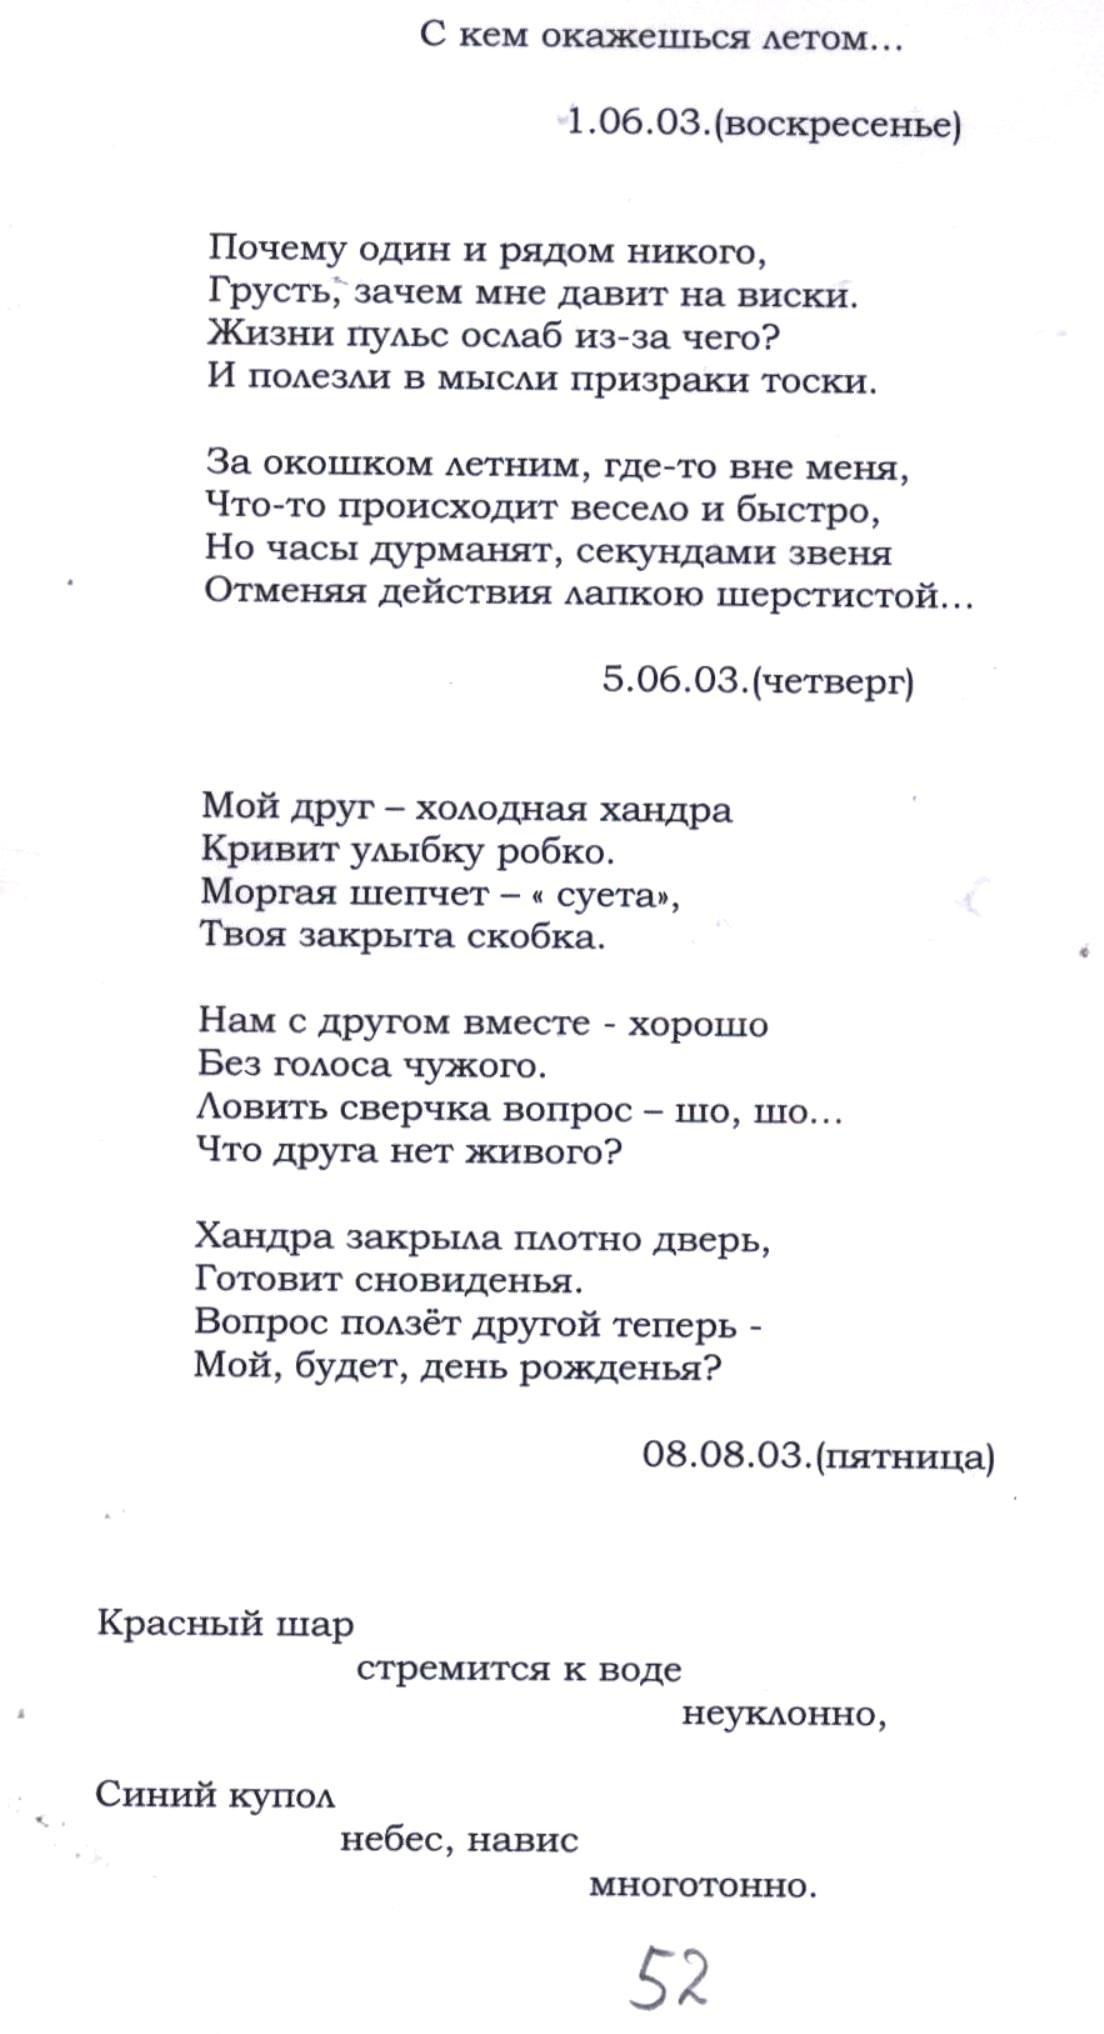 Стихи 051.jpg